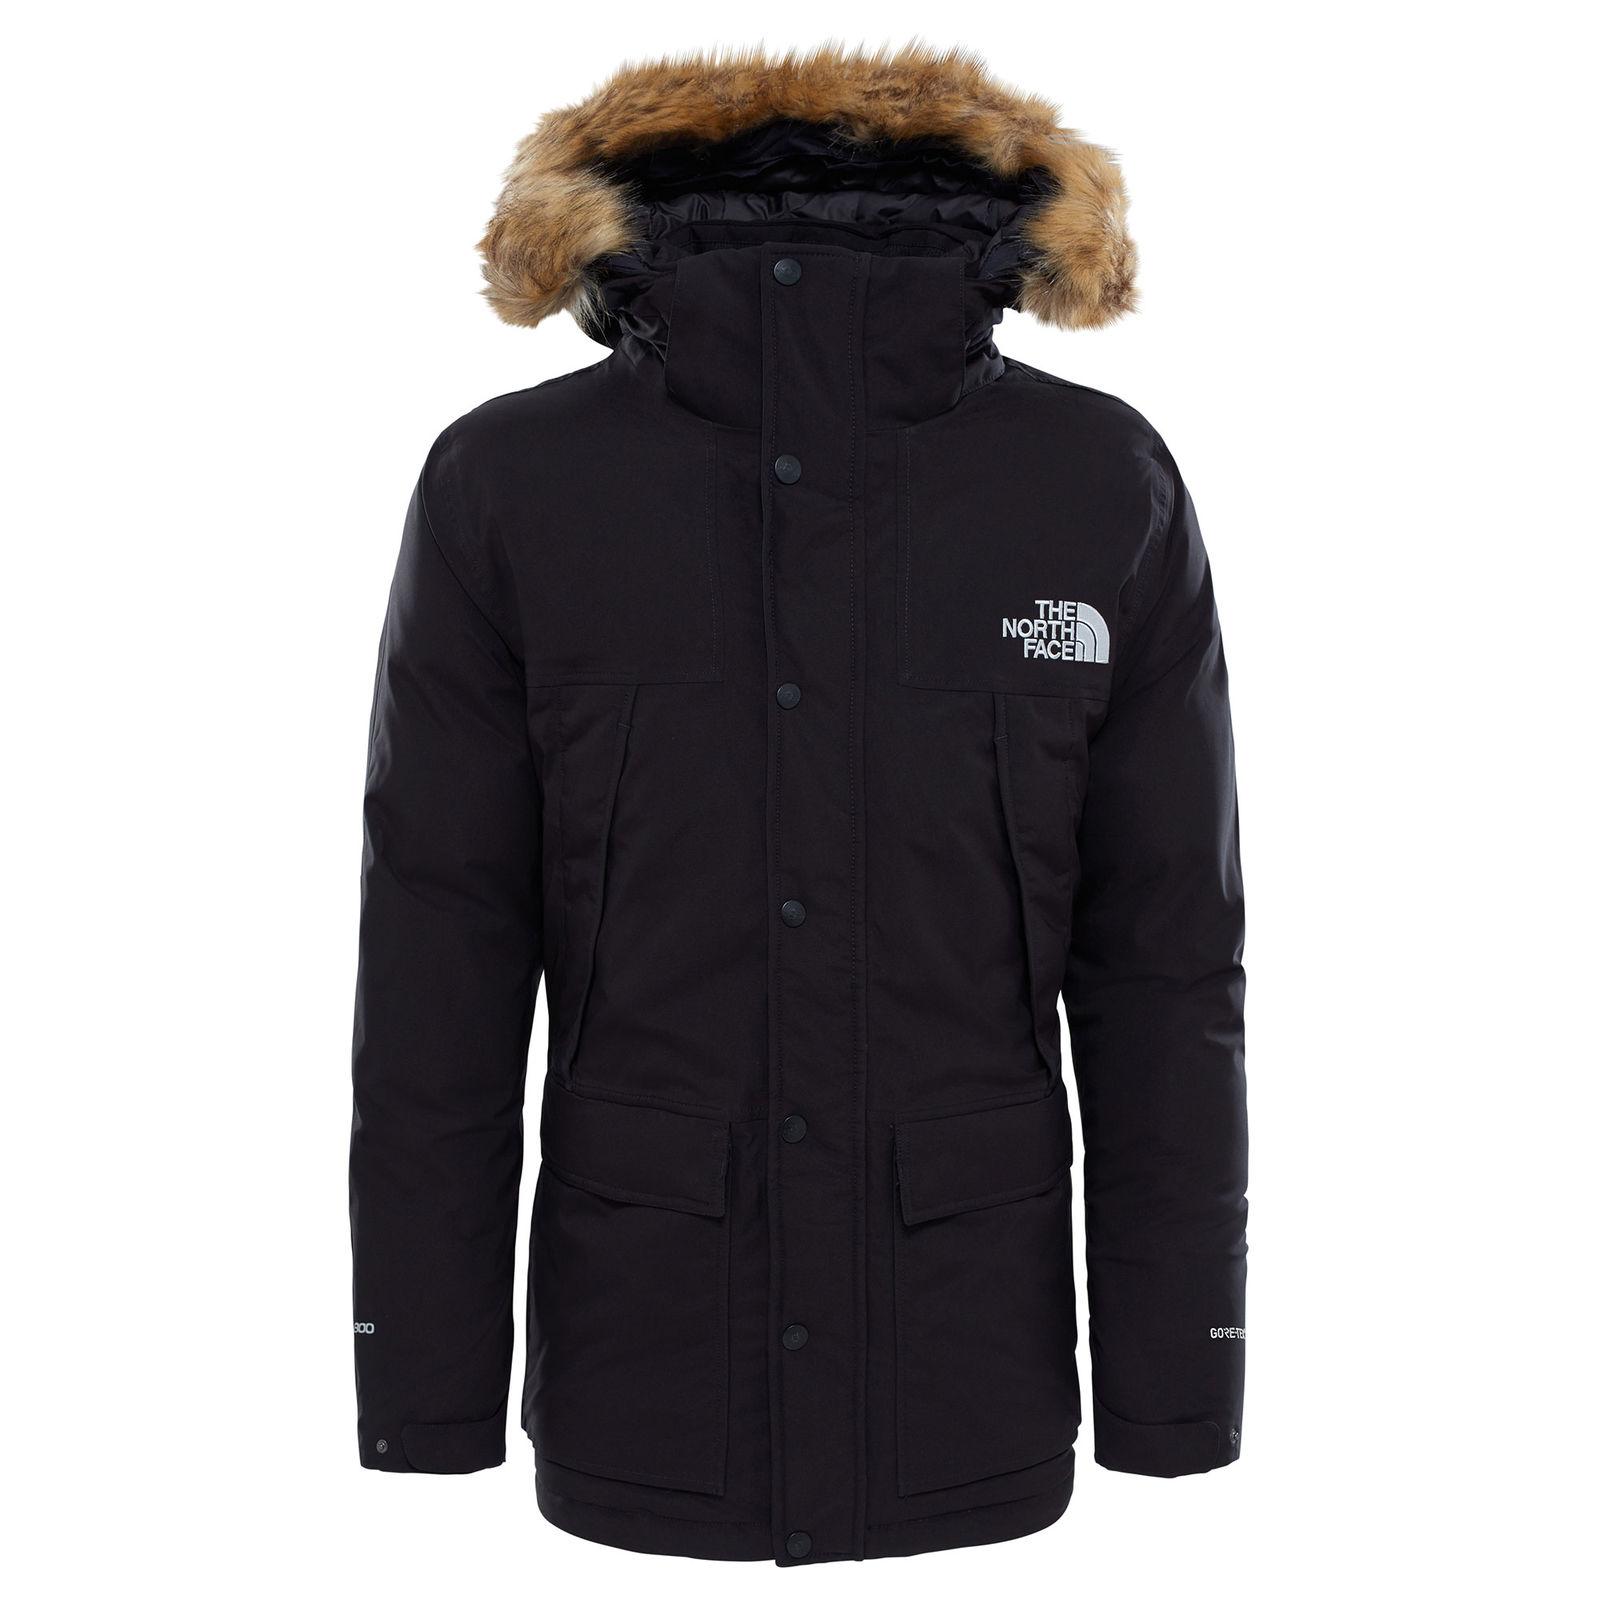 Куртка Для Активного Отдыха The North Face 2017-18 M Mountain Murdo Gtx Tnf Black